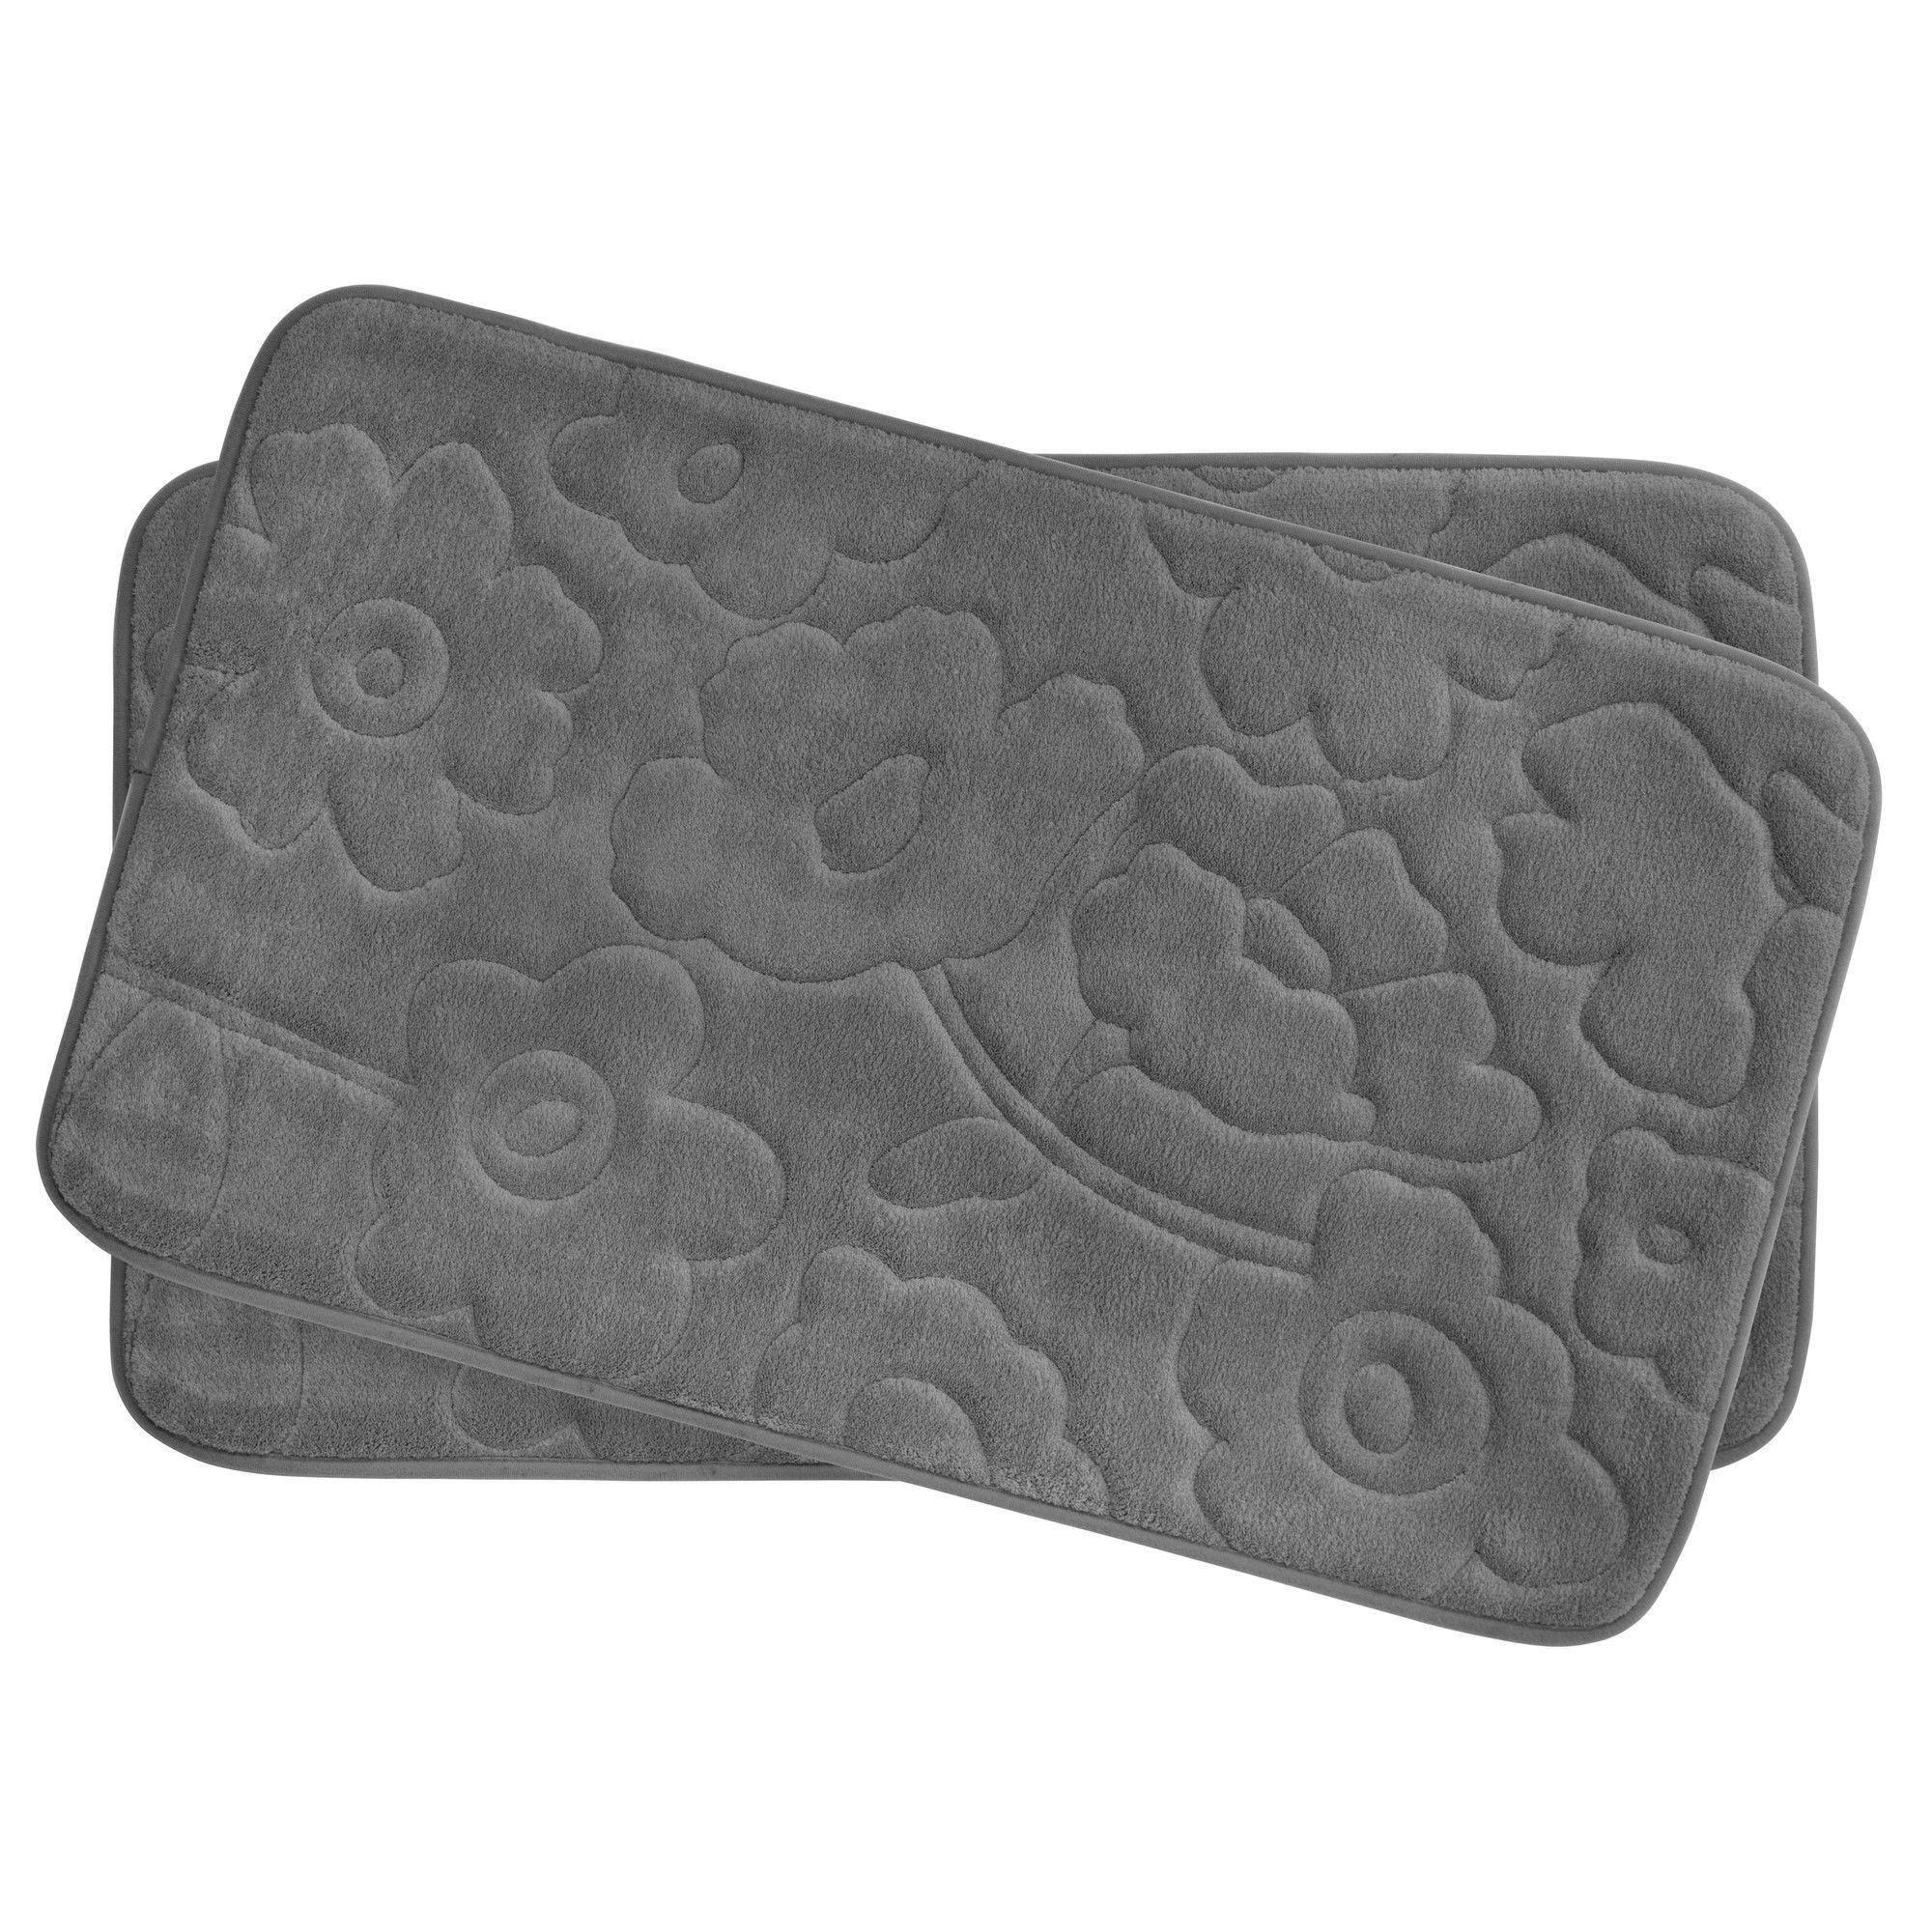 Stencil Floral Small 2 Piece Plush Memory Foam Bath Mat Set Bath